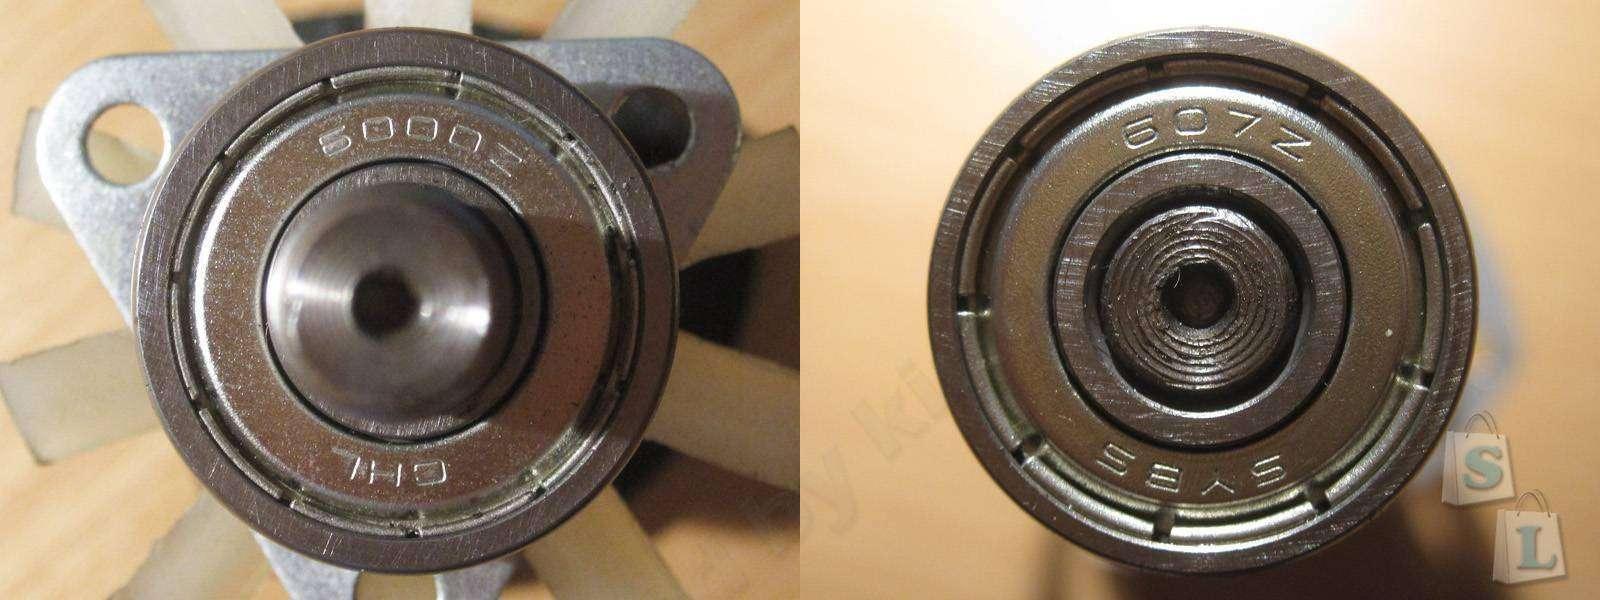 Banggood: 0.6-6.5mm 400W 220V Mini Die Grinder. Или просто гравер.